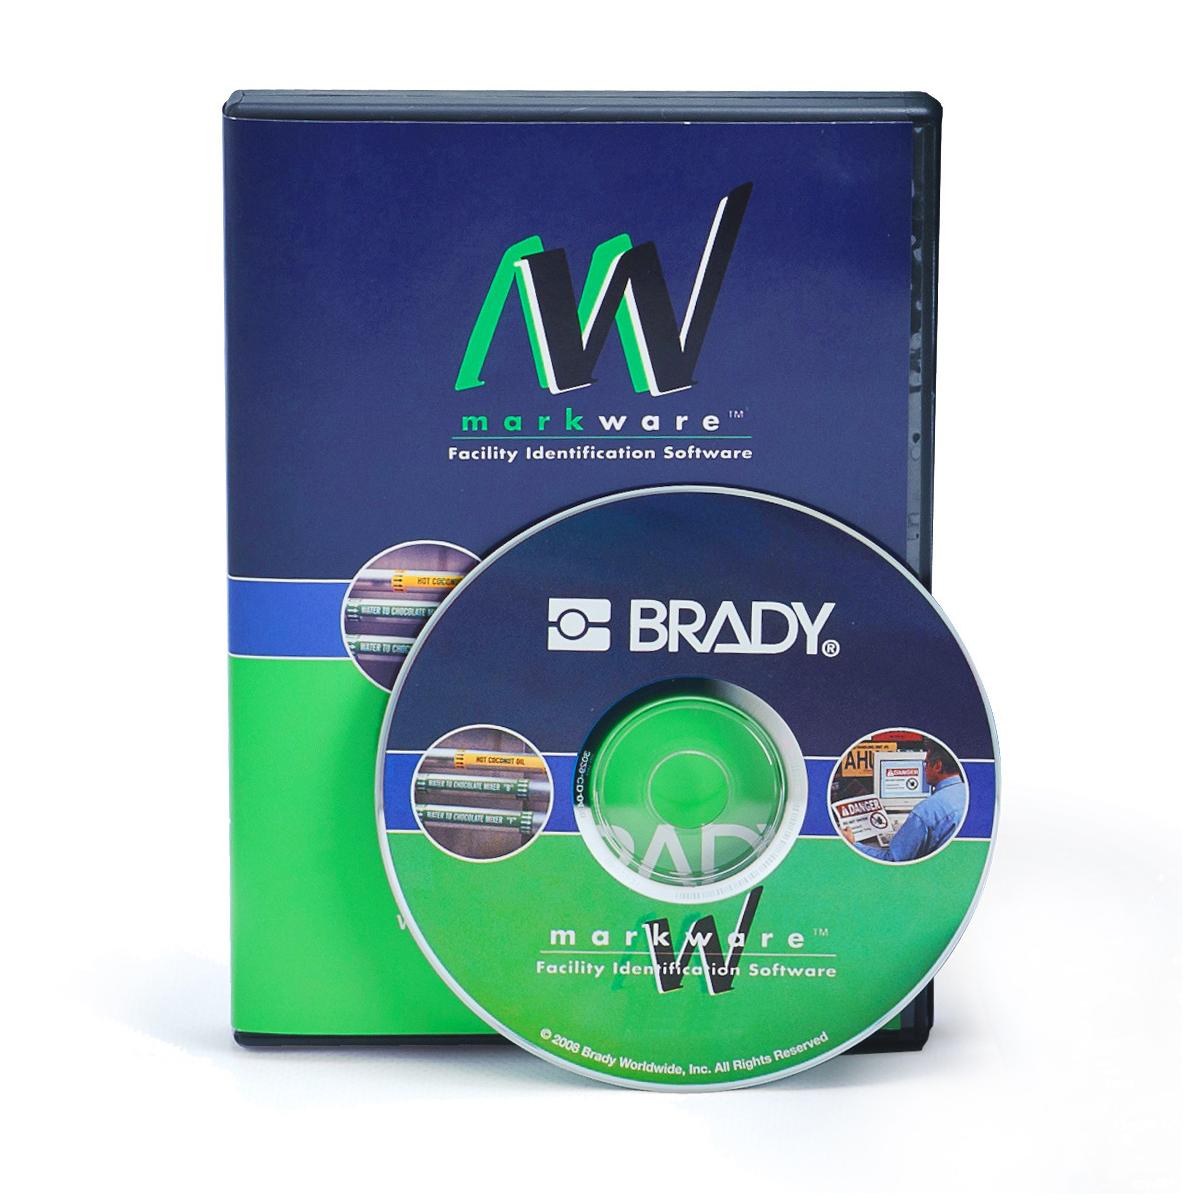 Brady® 13597 R10000 1-Color Industrial Grade Printer Ribbon, 200 ft L x 6-1/4 in W, Resin, Green